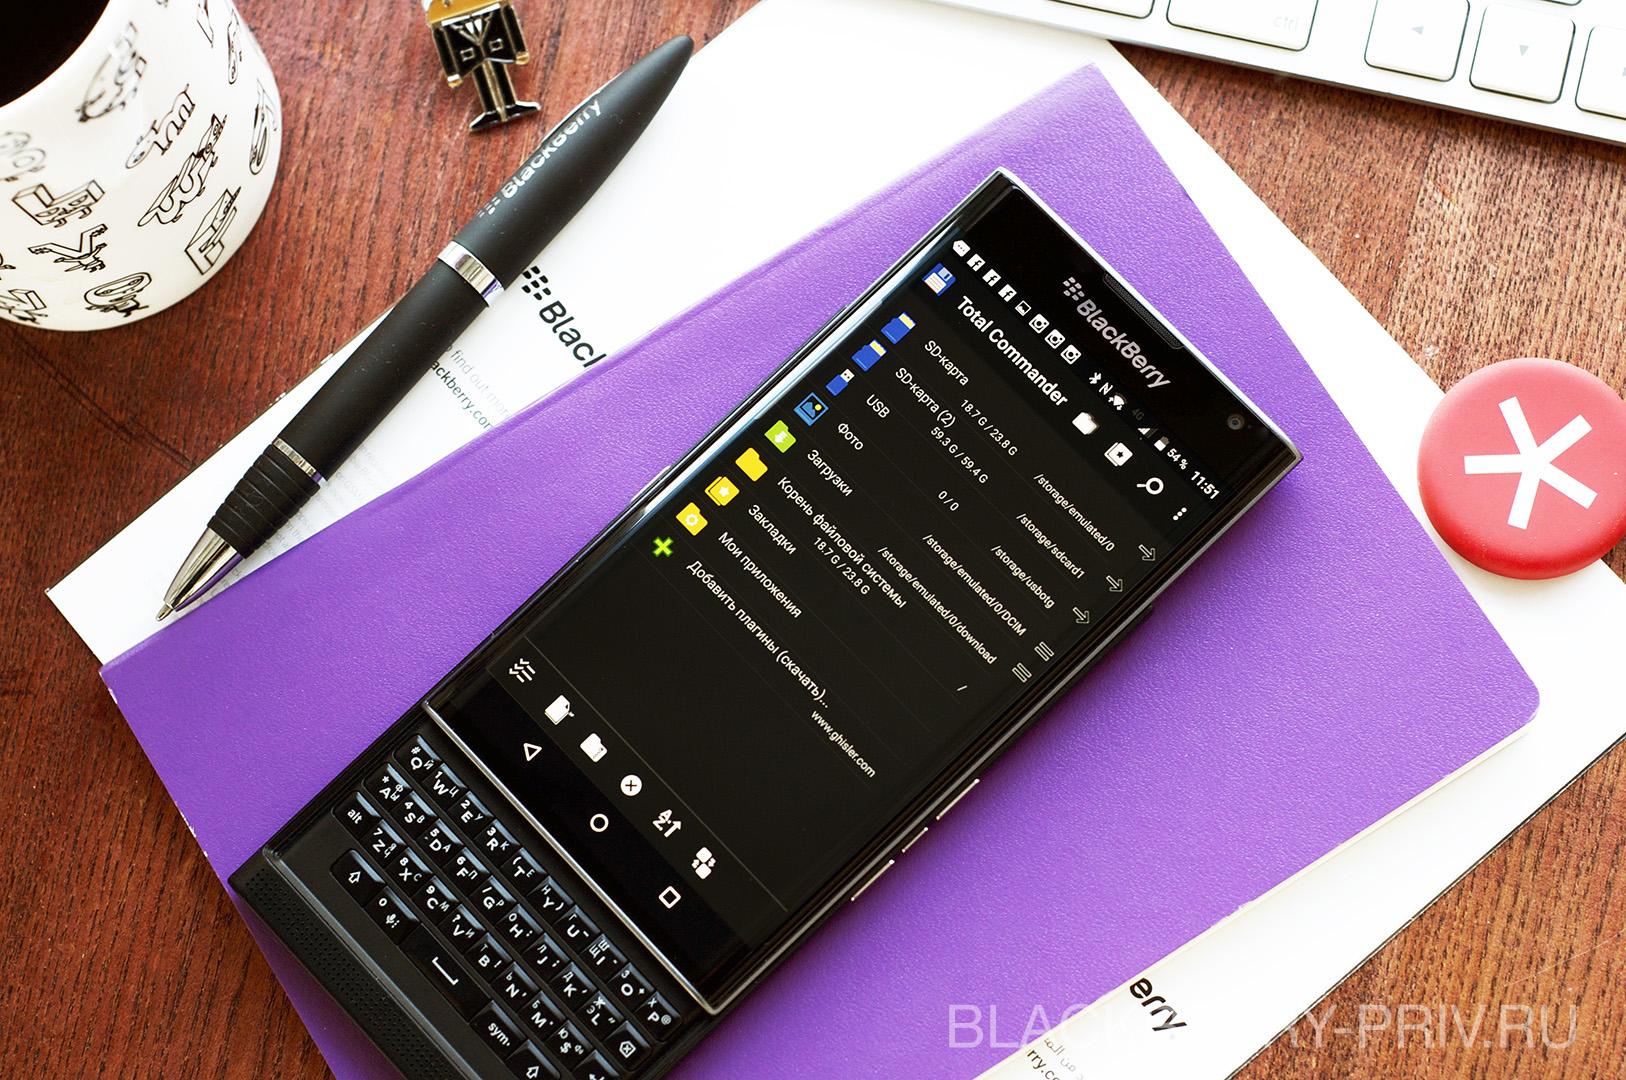 BlackBerry-PRIV-FM-11